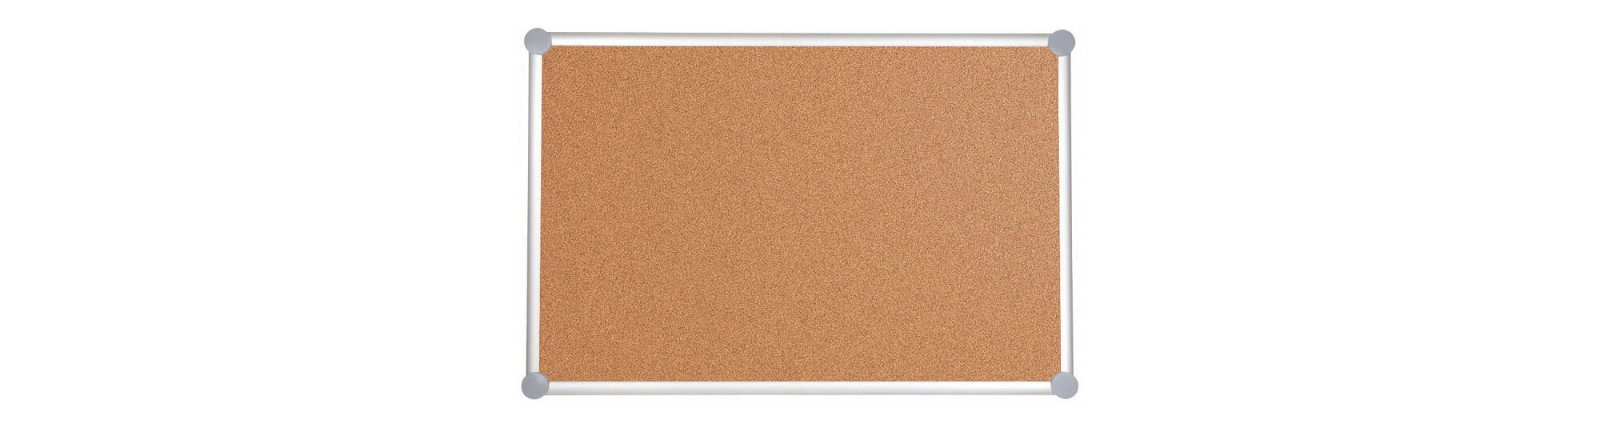 Pinnboard 2000 MAULpro, Kork, 100x150 cm, grau